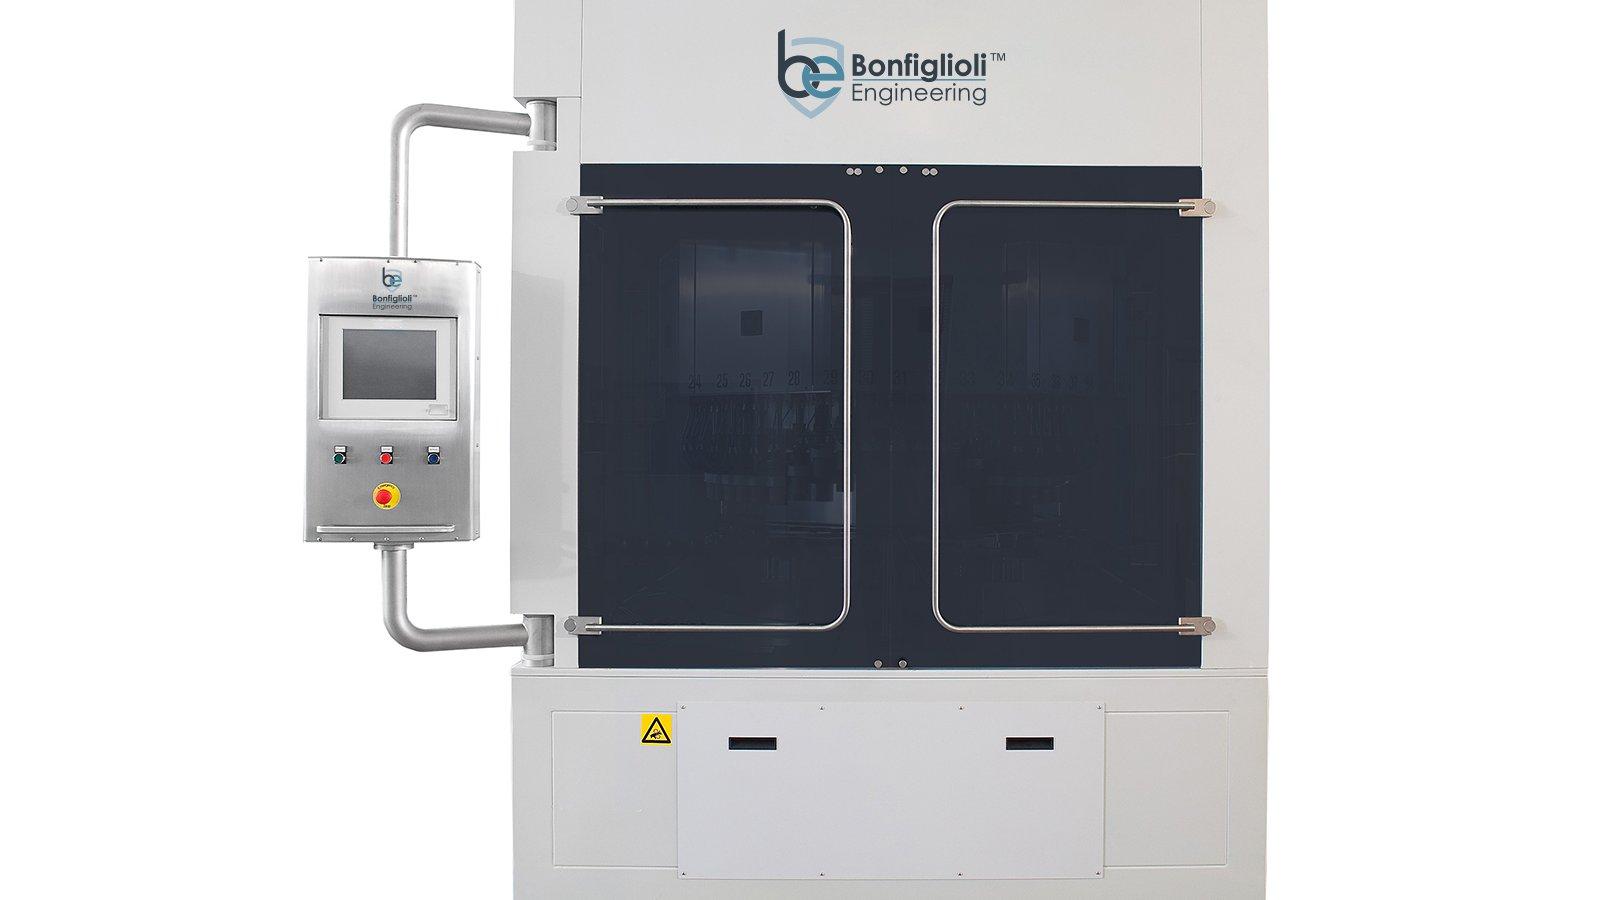 RLD-230_FRONT.2e16d0ba.fill-1920x1080